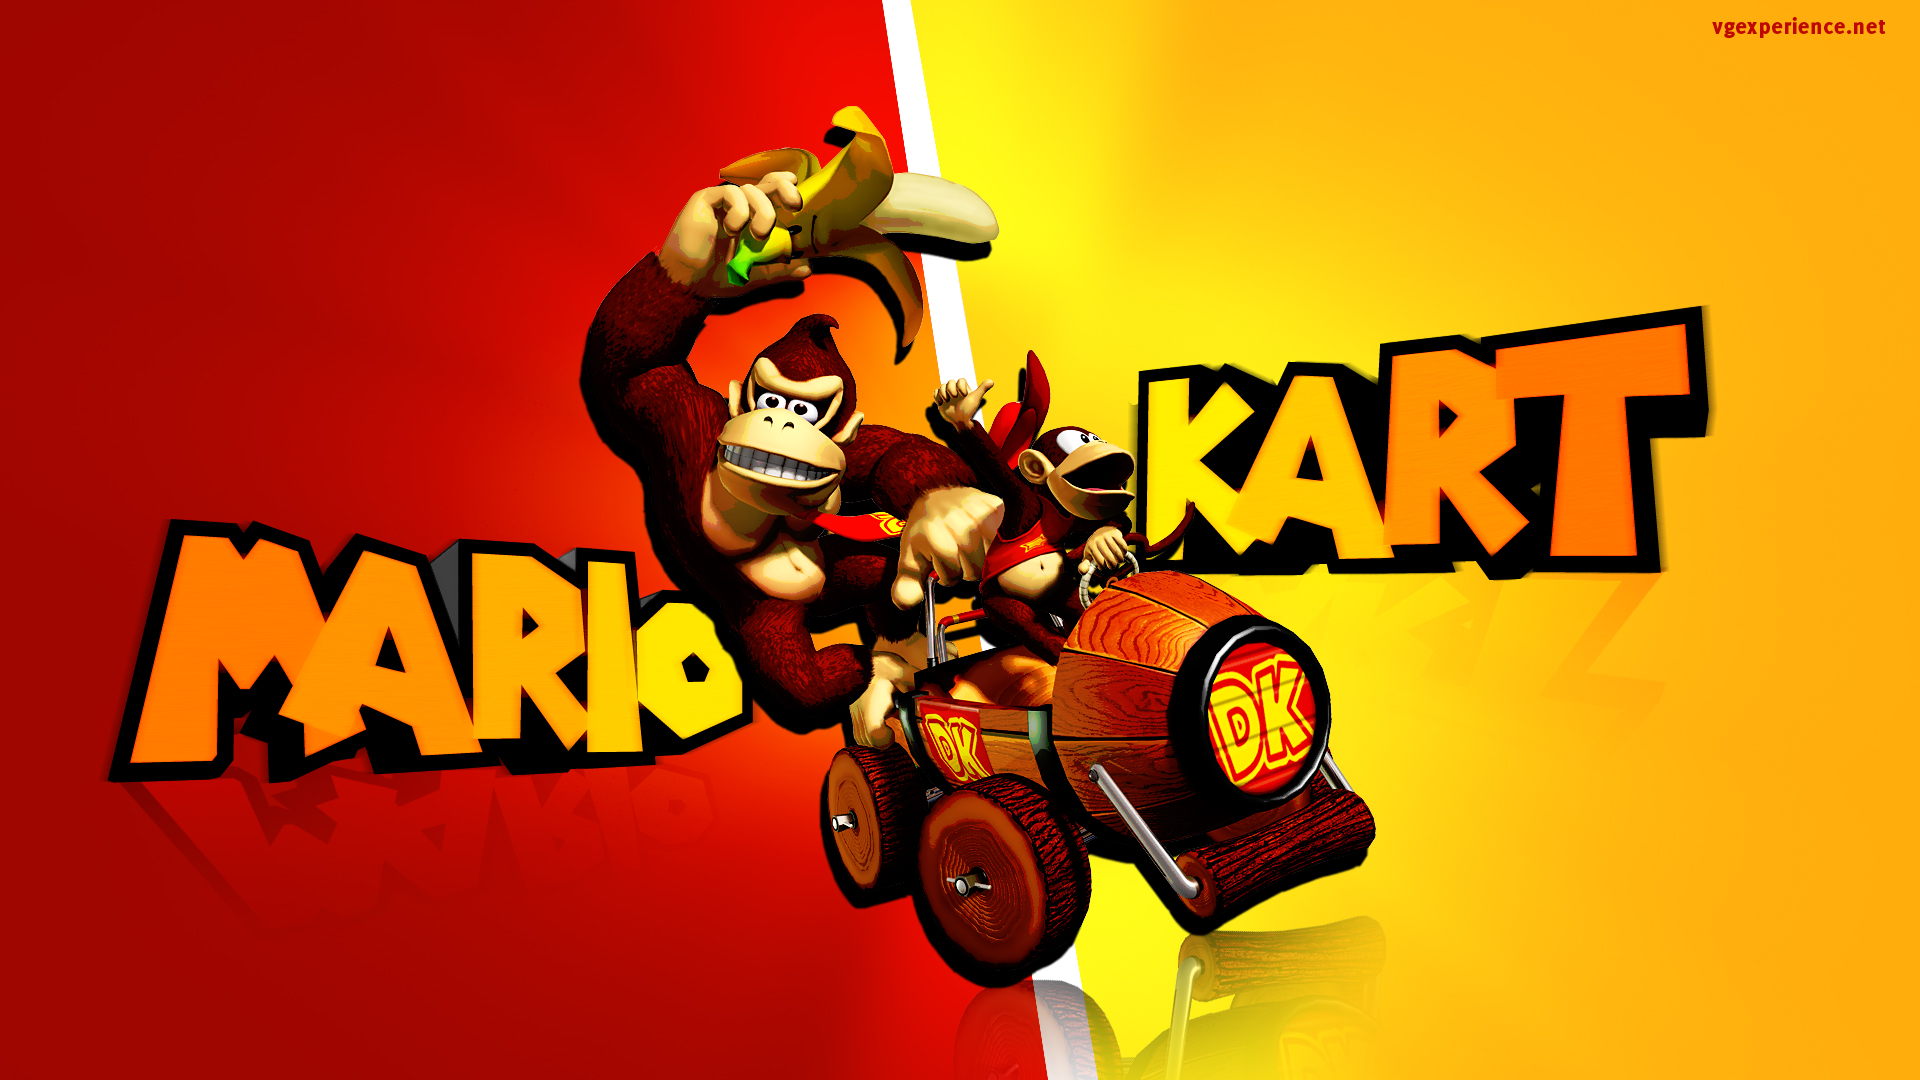 Free Download Mario Kart Double Dash Art 1920x1080 For Your Desktop Mobile Tablet Explore 76 Mario Kart Wallpaper Mario Wallpaper Hd Super Mario Kart Wallpaper Mario Kart 64 Wallpaper